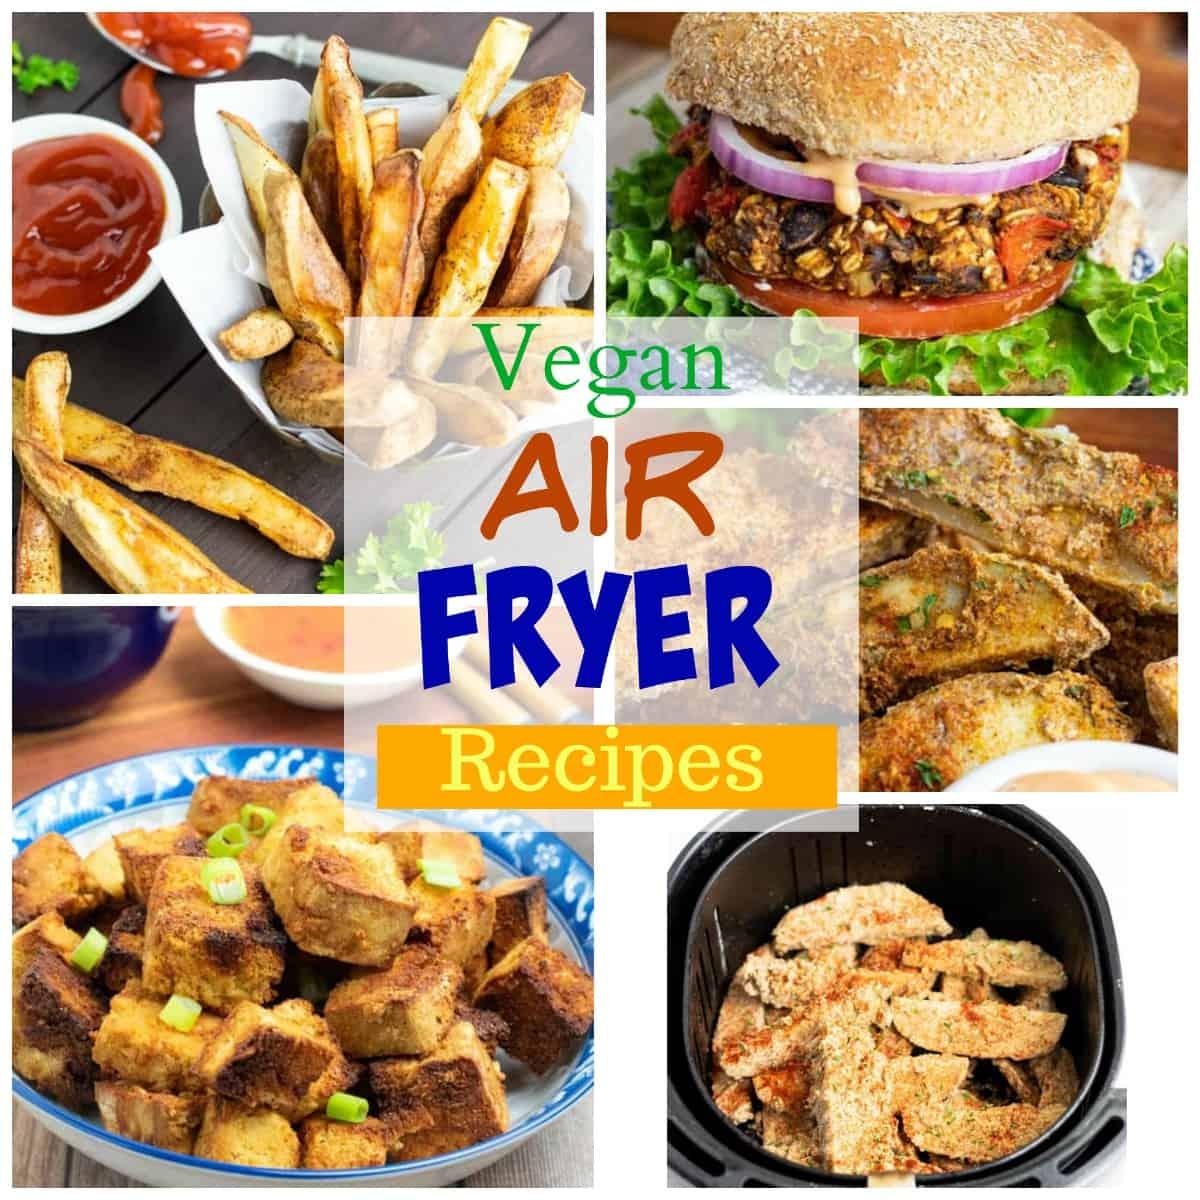 vegan air fryer recipes photo collage for pinterest